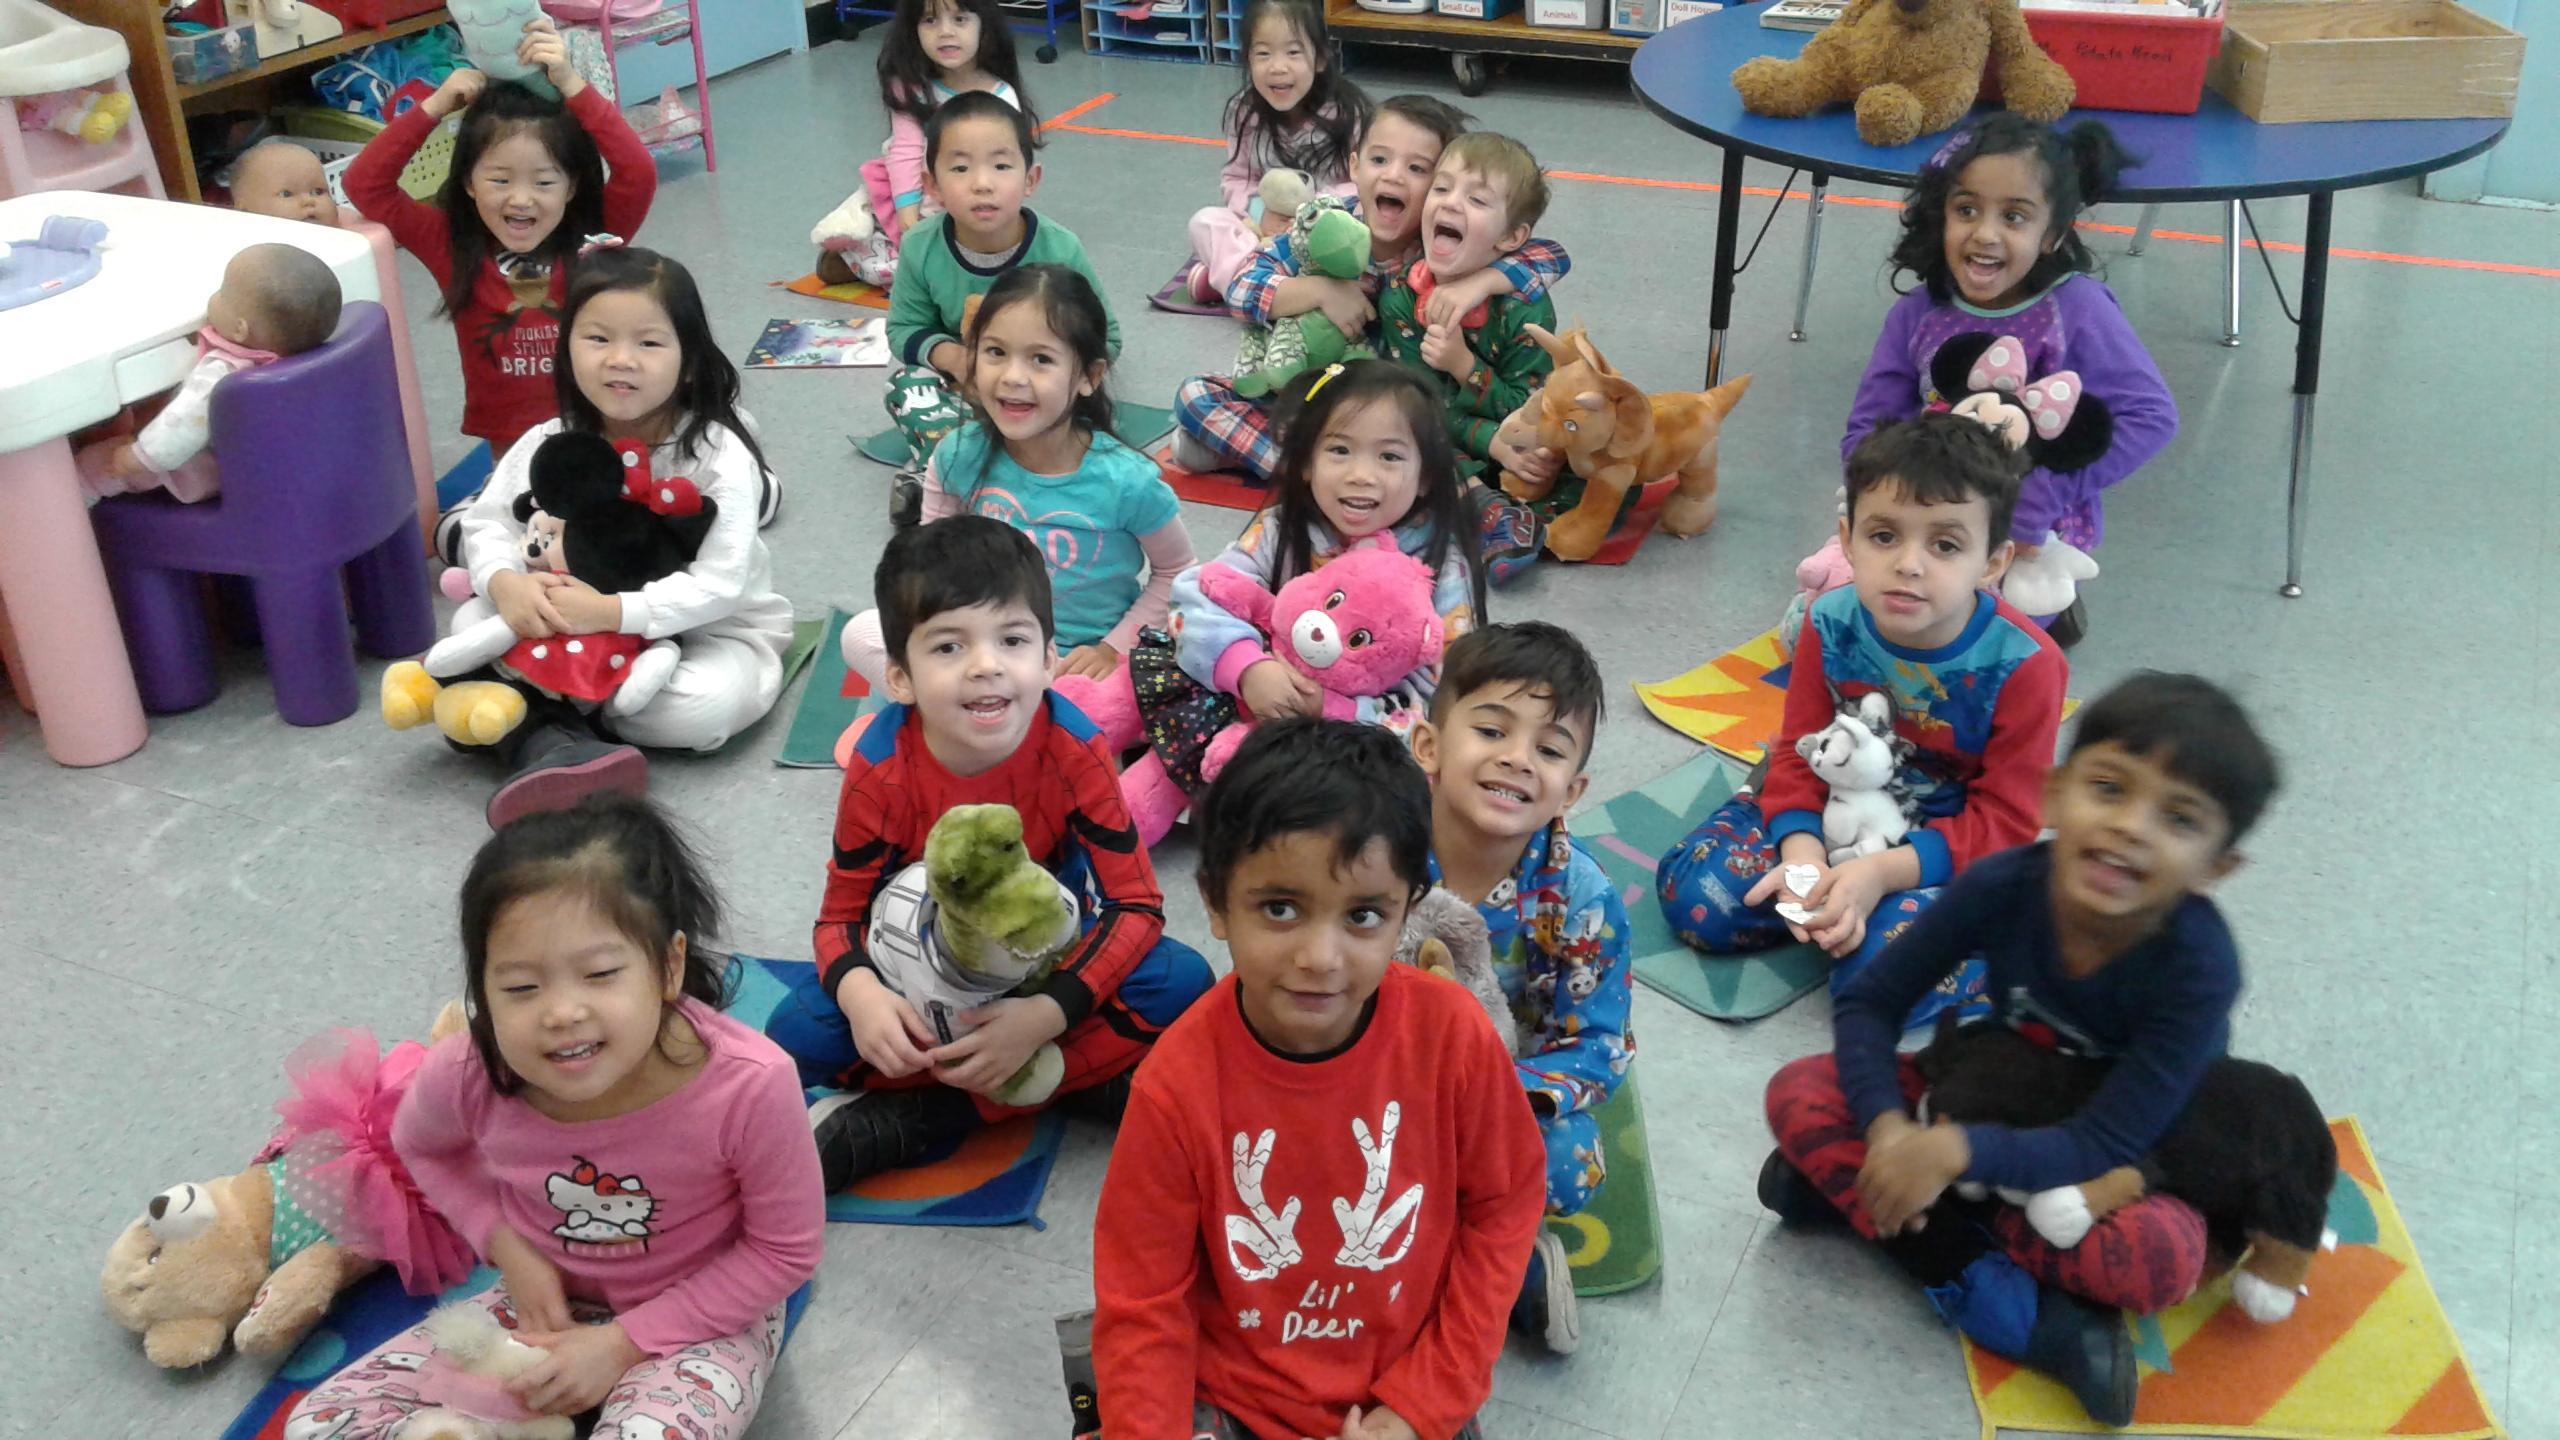 Preschoolers Enjoy Pajama Day